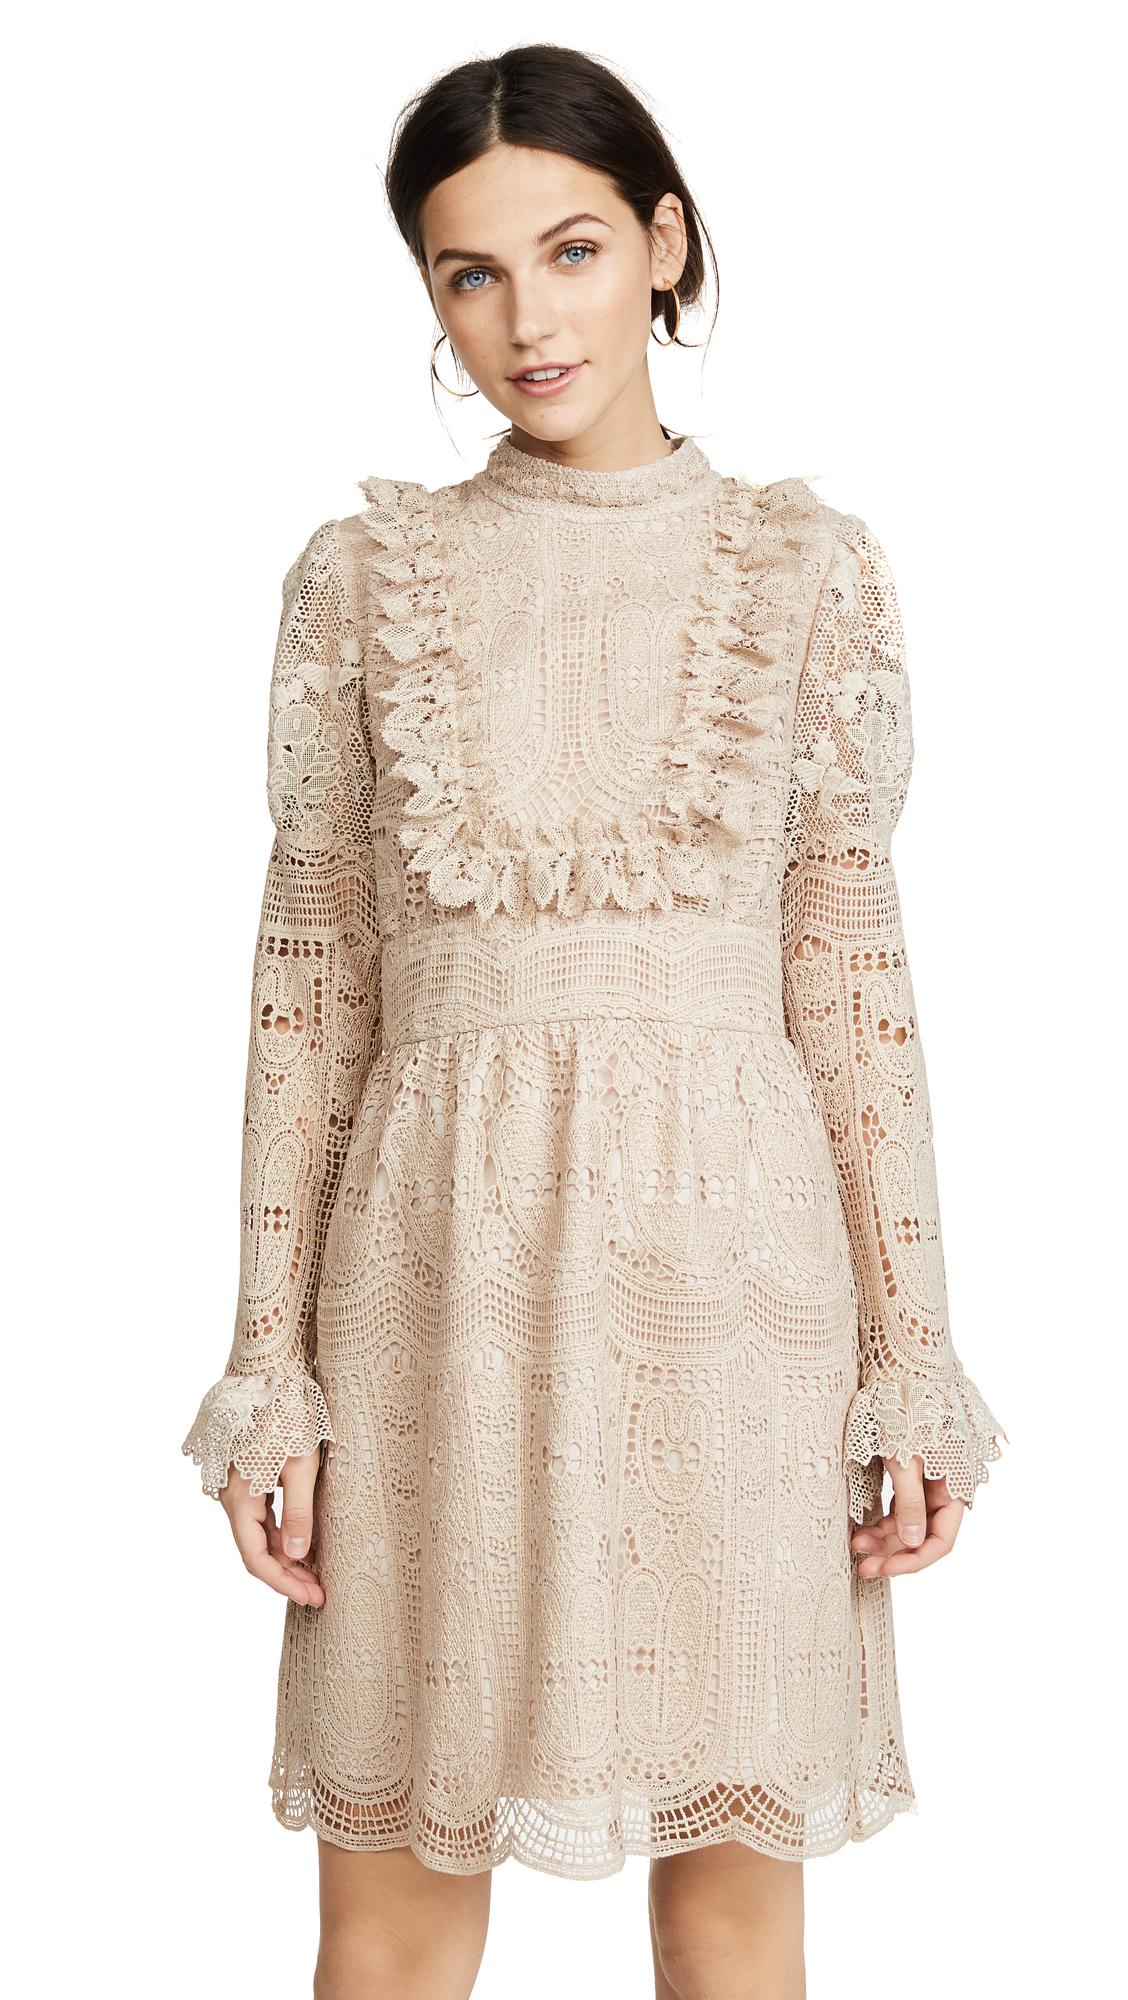 Anna Sui Cupid's Clouds & Scallop Lace Dress